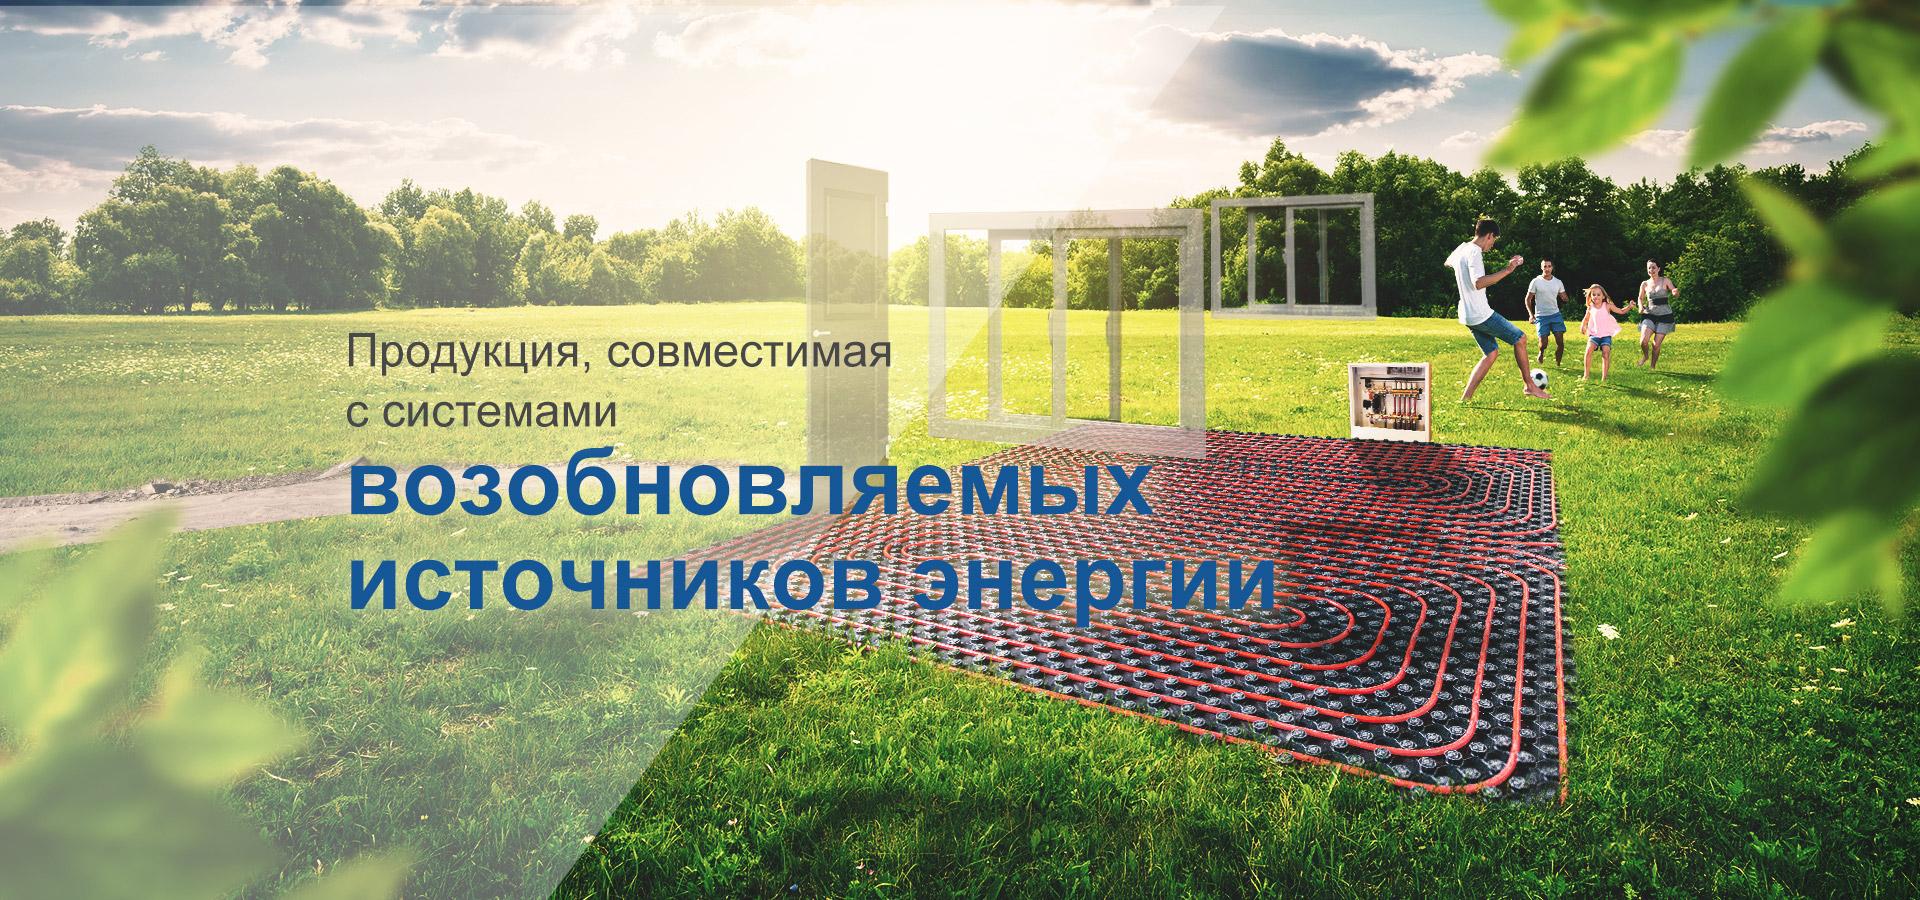 banner-2-rus